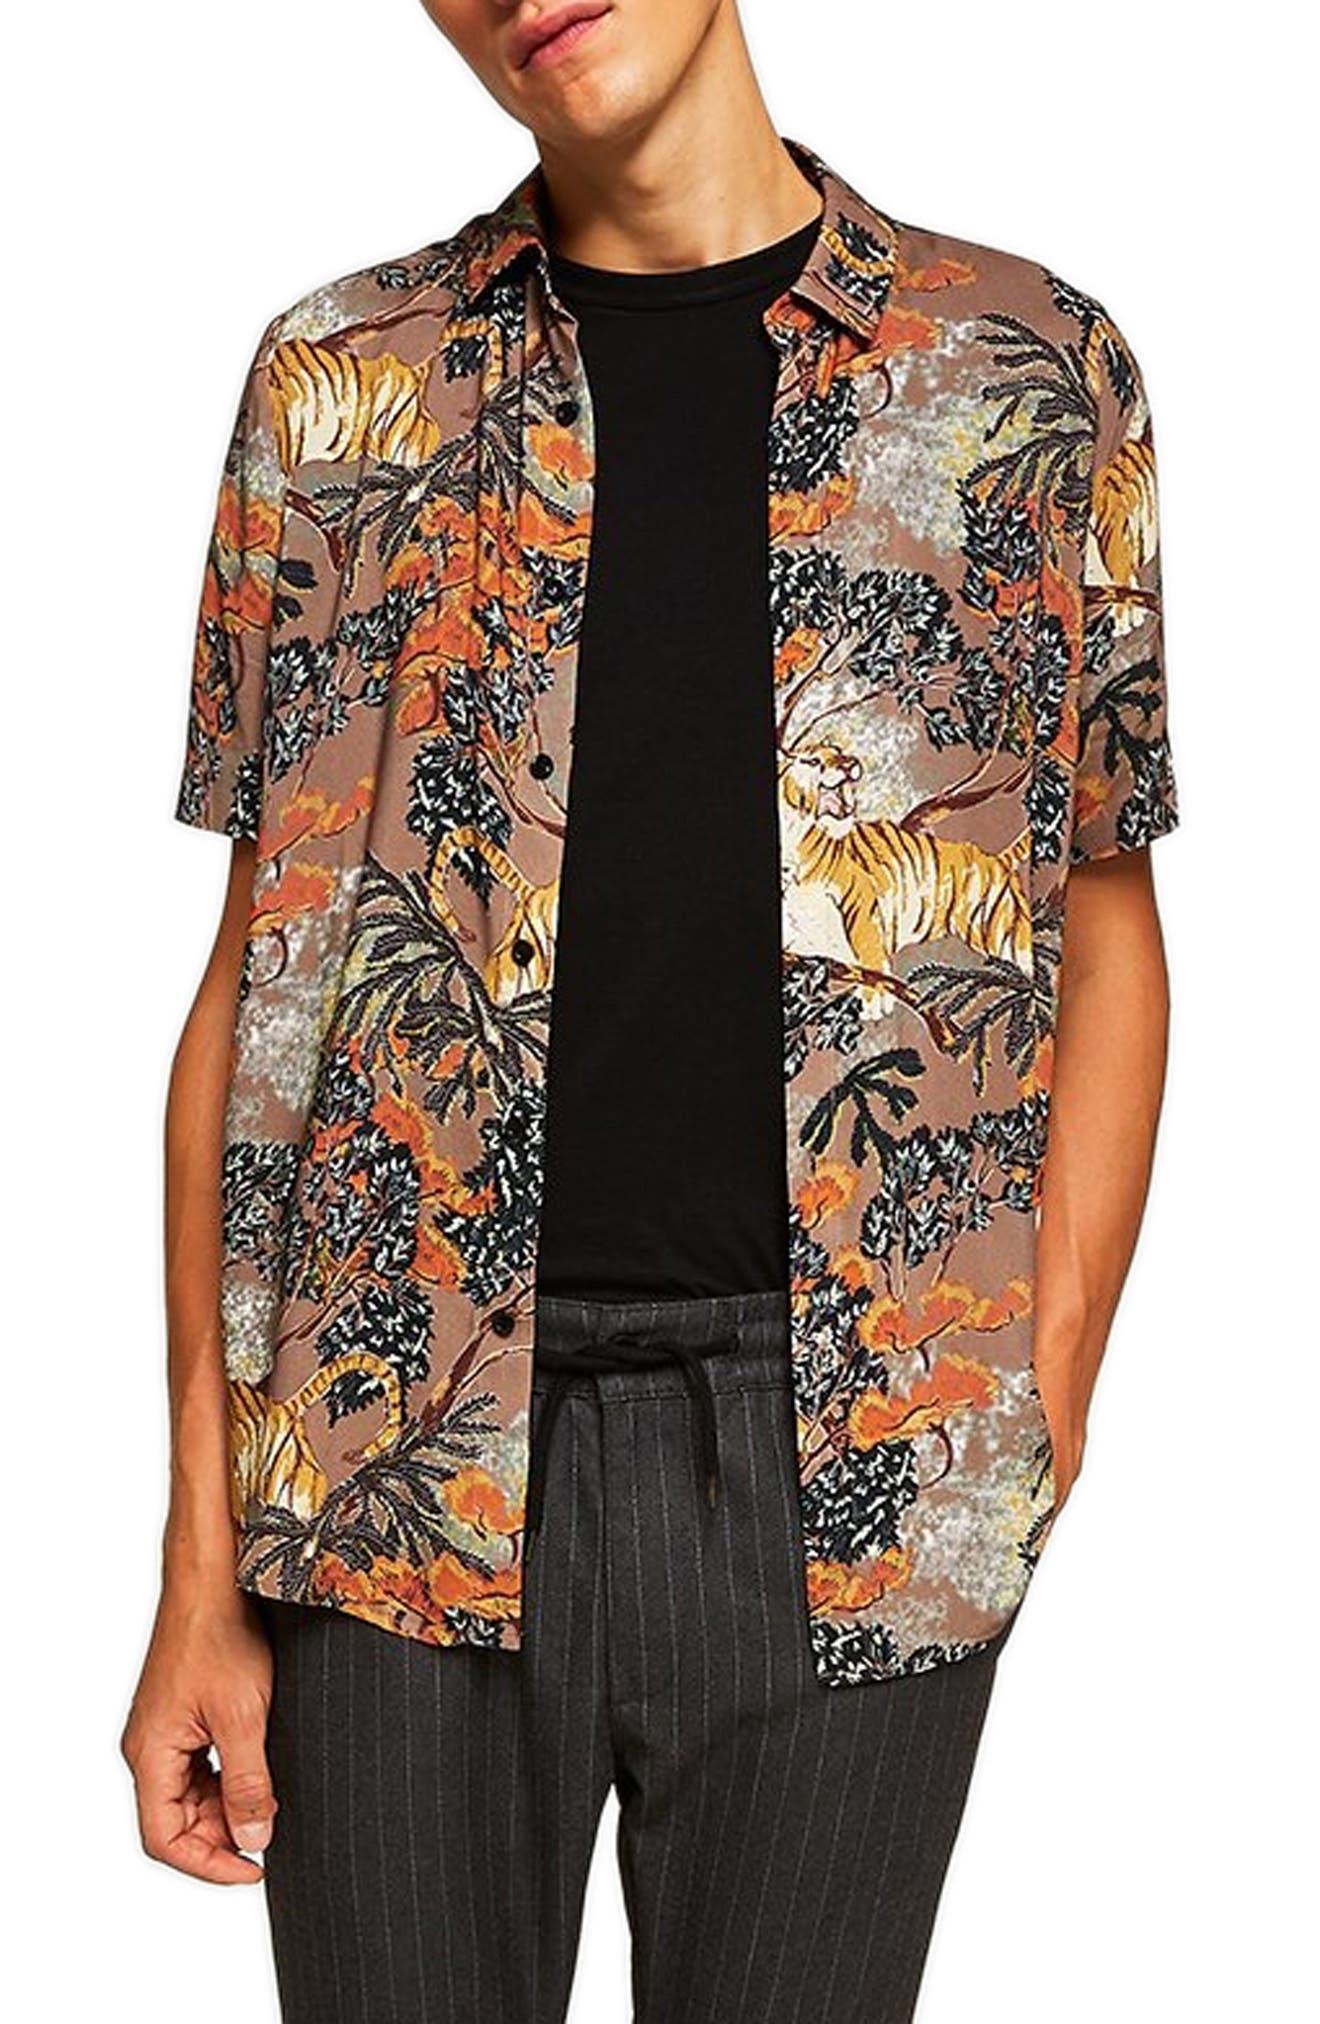 Suburb Tiger Print Shirt,                         Main,                         color, ORANGE MULTI